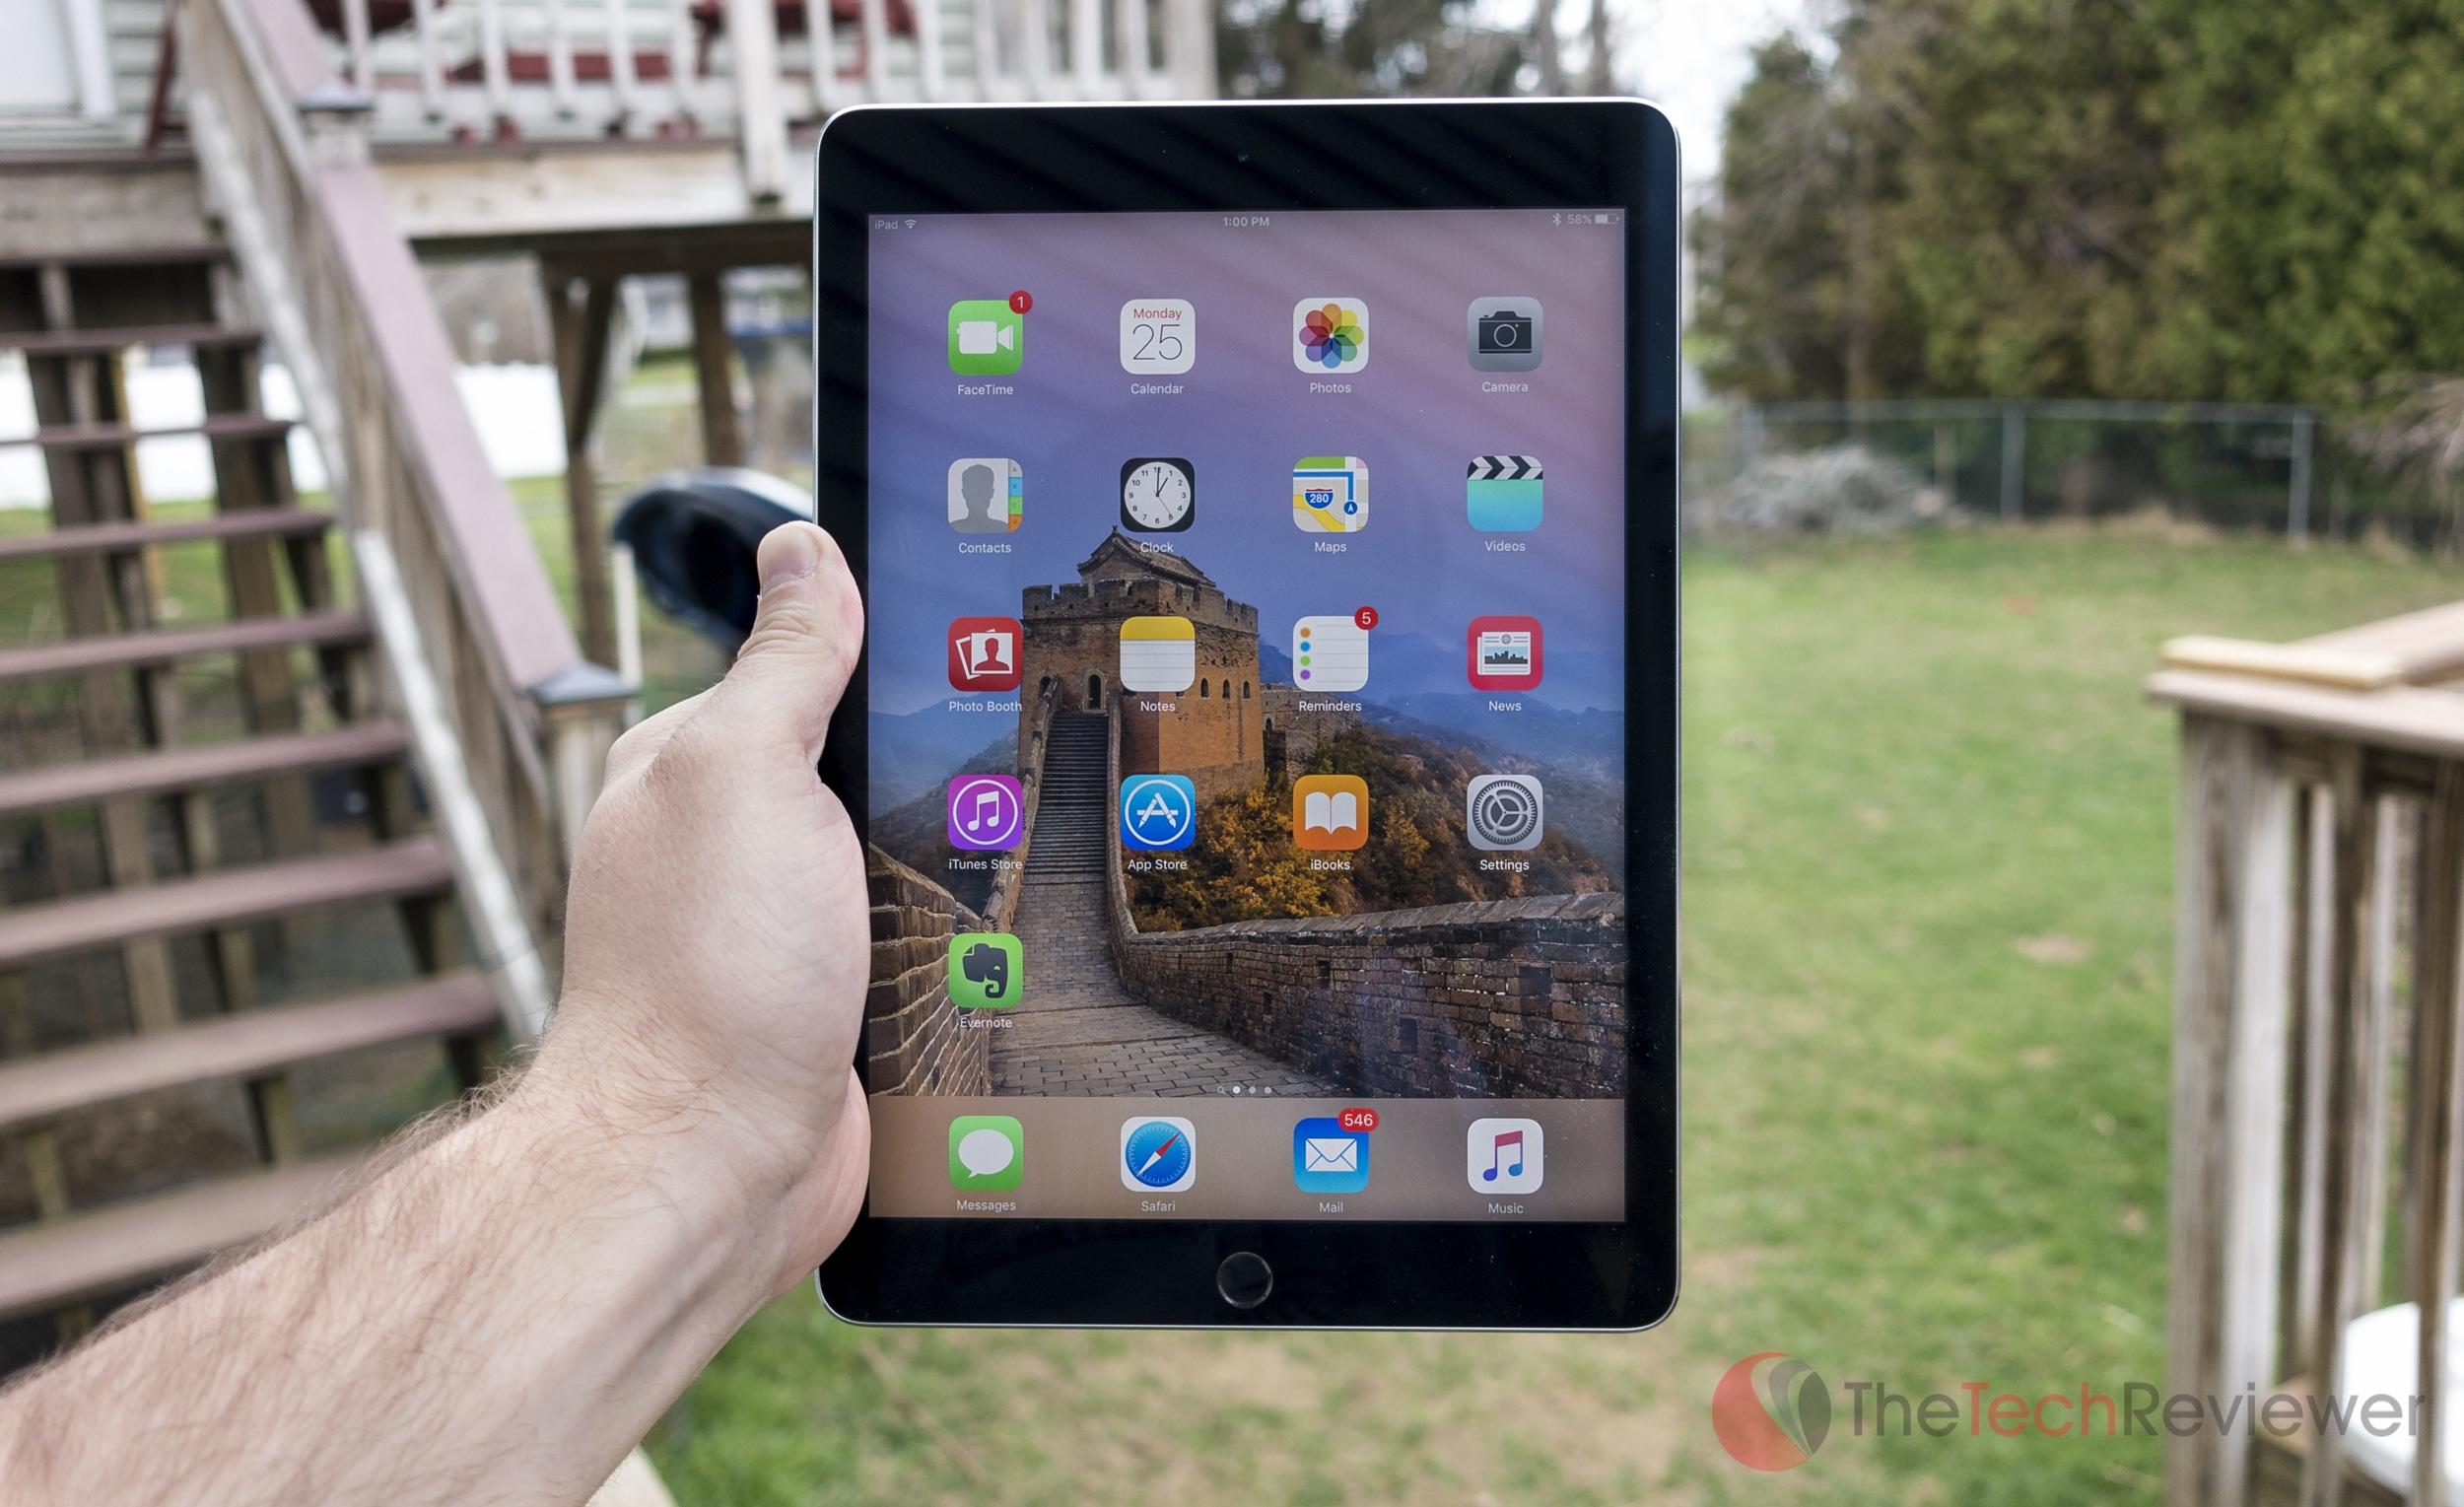 Apple%20iPad%20Pro%209.7-inch-1